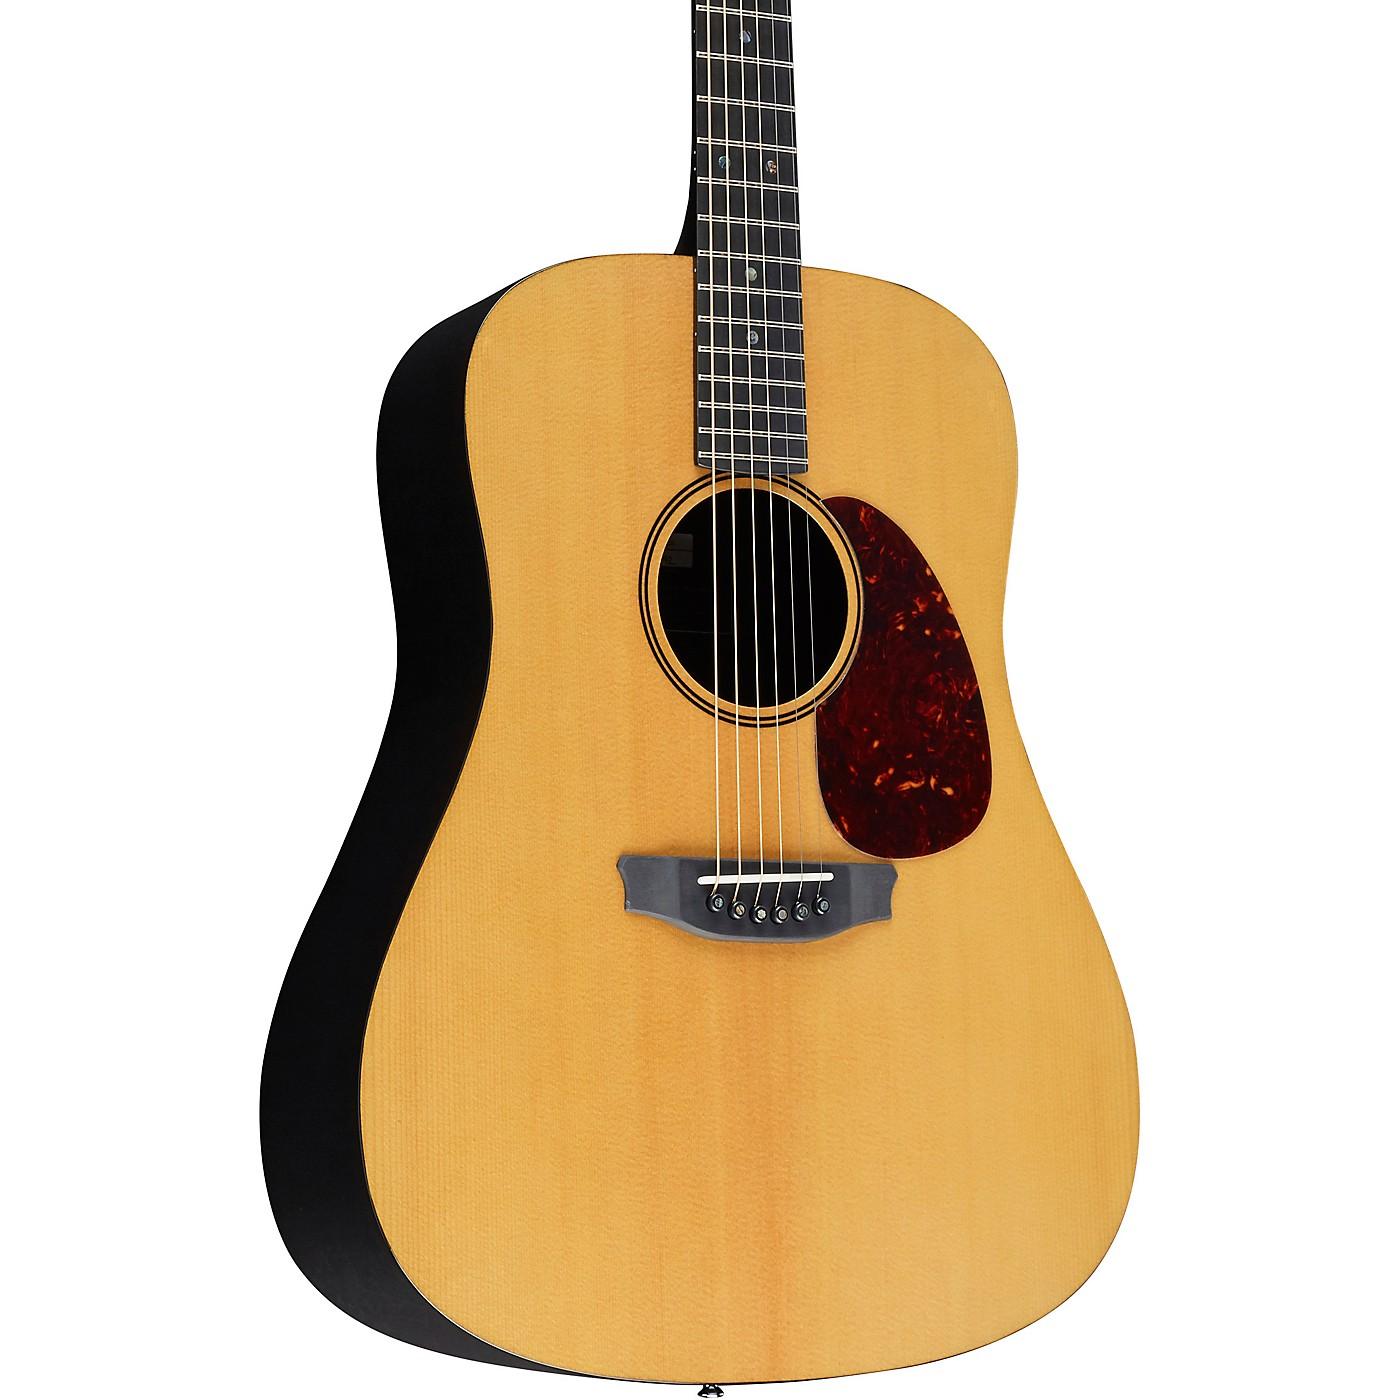 Rainsong V-DR1100N2 Vintage Series Dreadnought Acoustic Guitar thumbnail